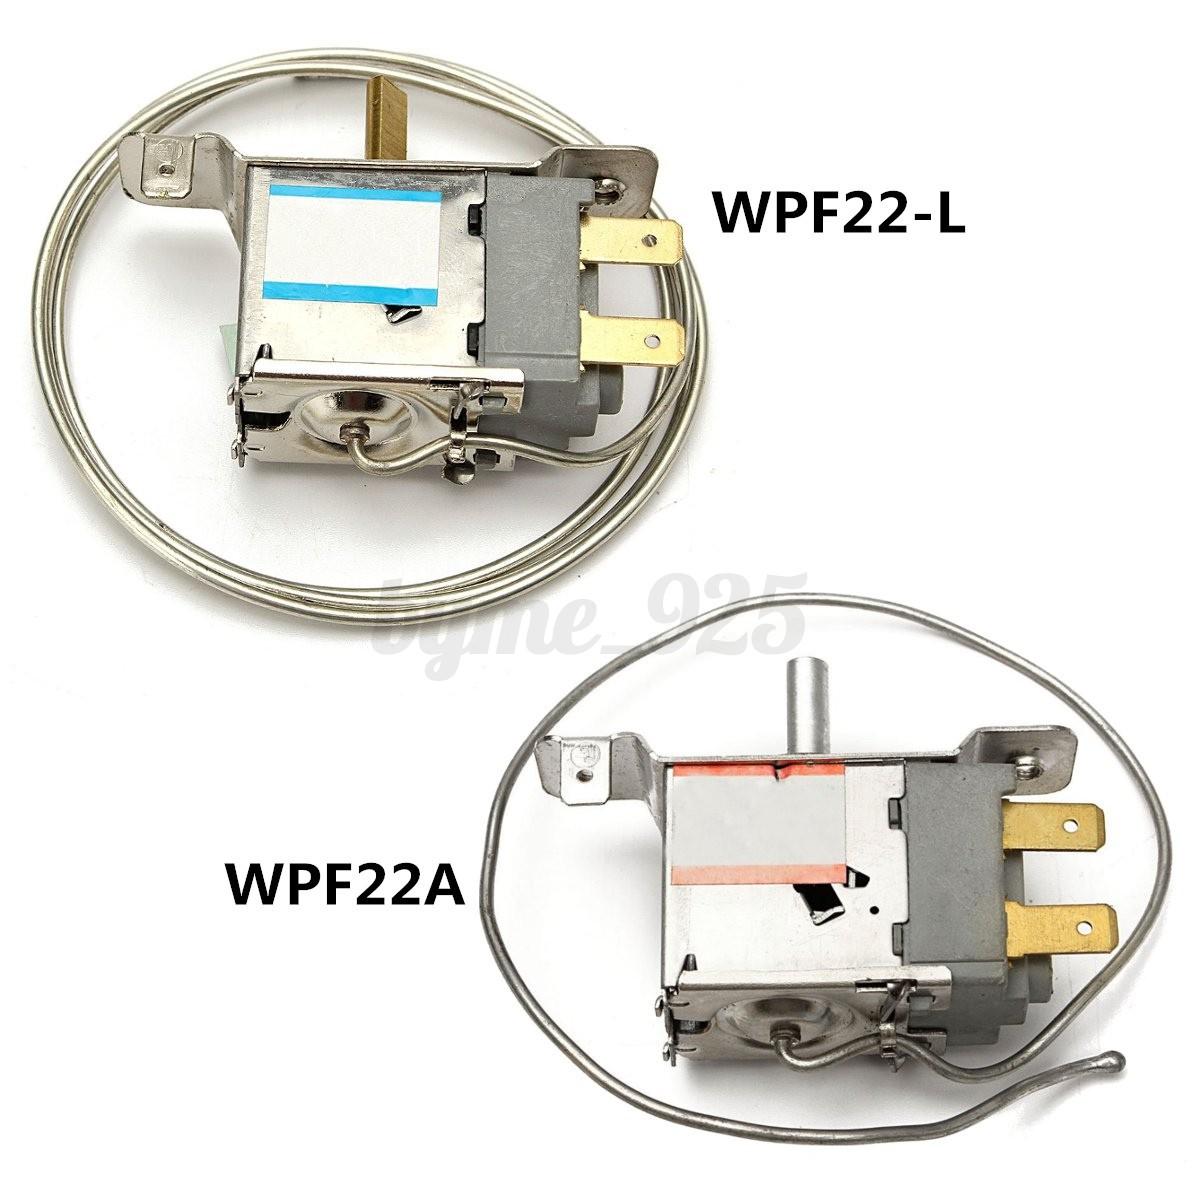 Temperature Controller Thermostat for Refrigerator WPF22-L 85cm WPF22A 30cm Cord